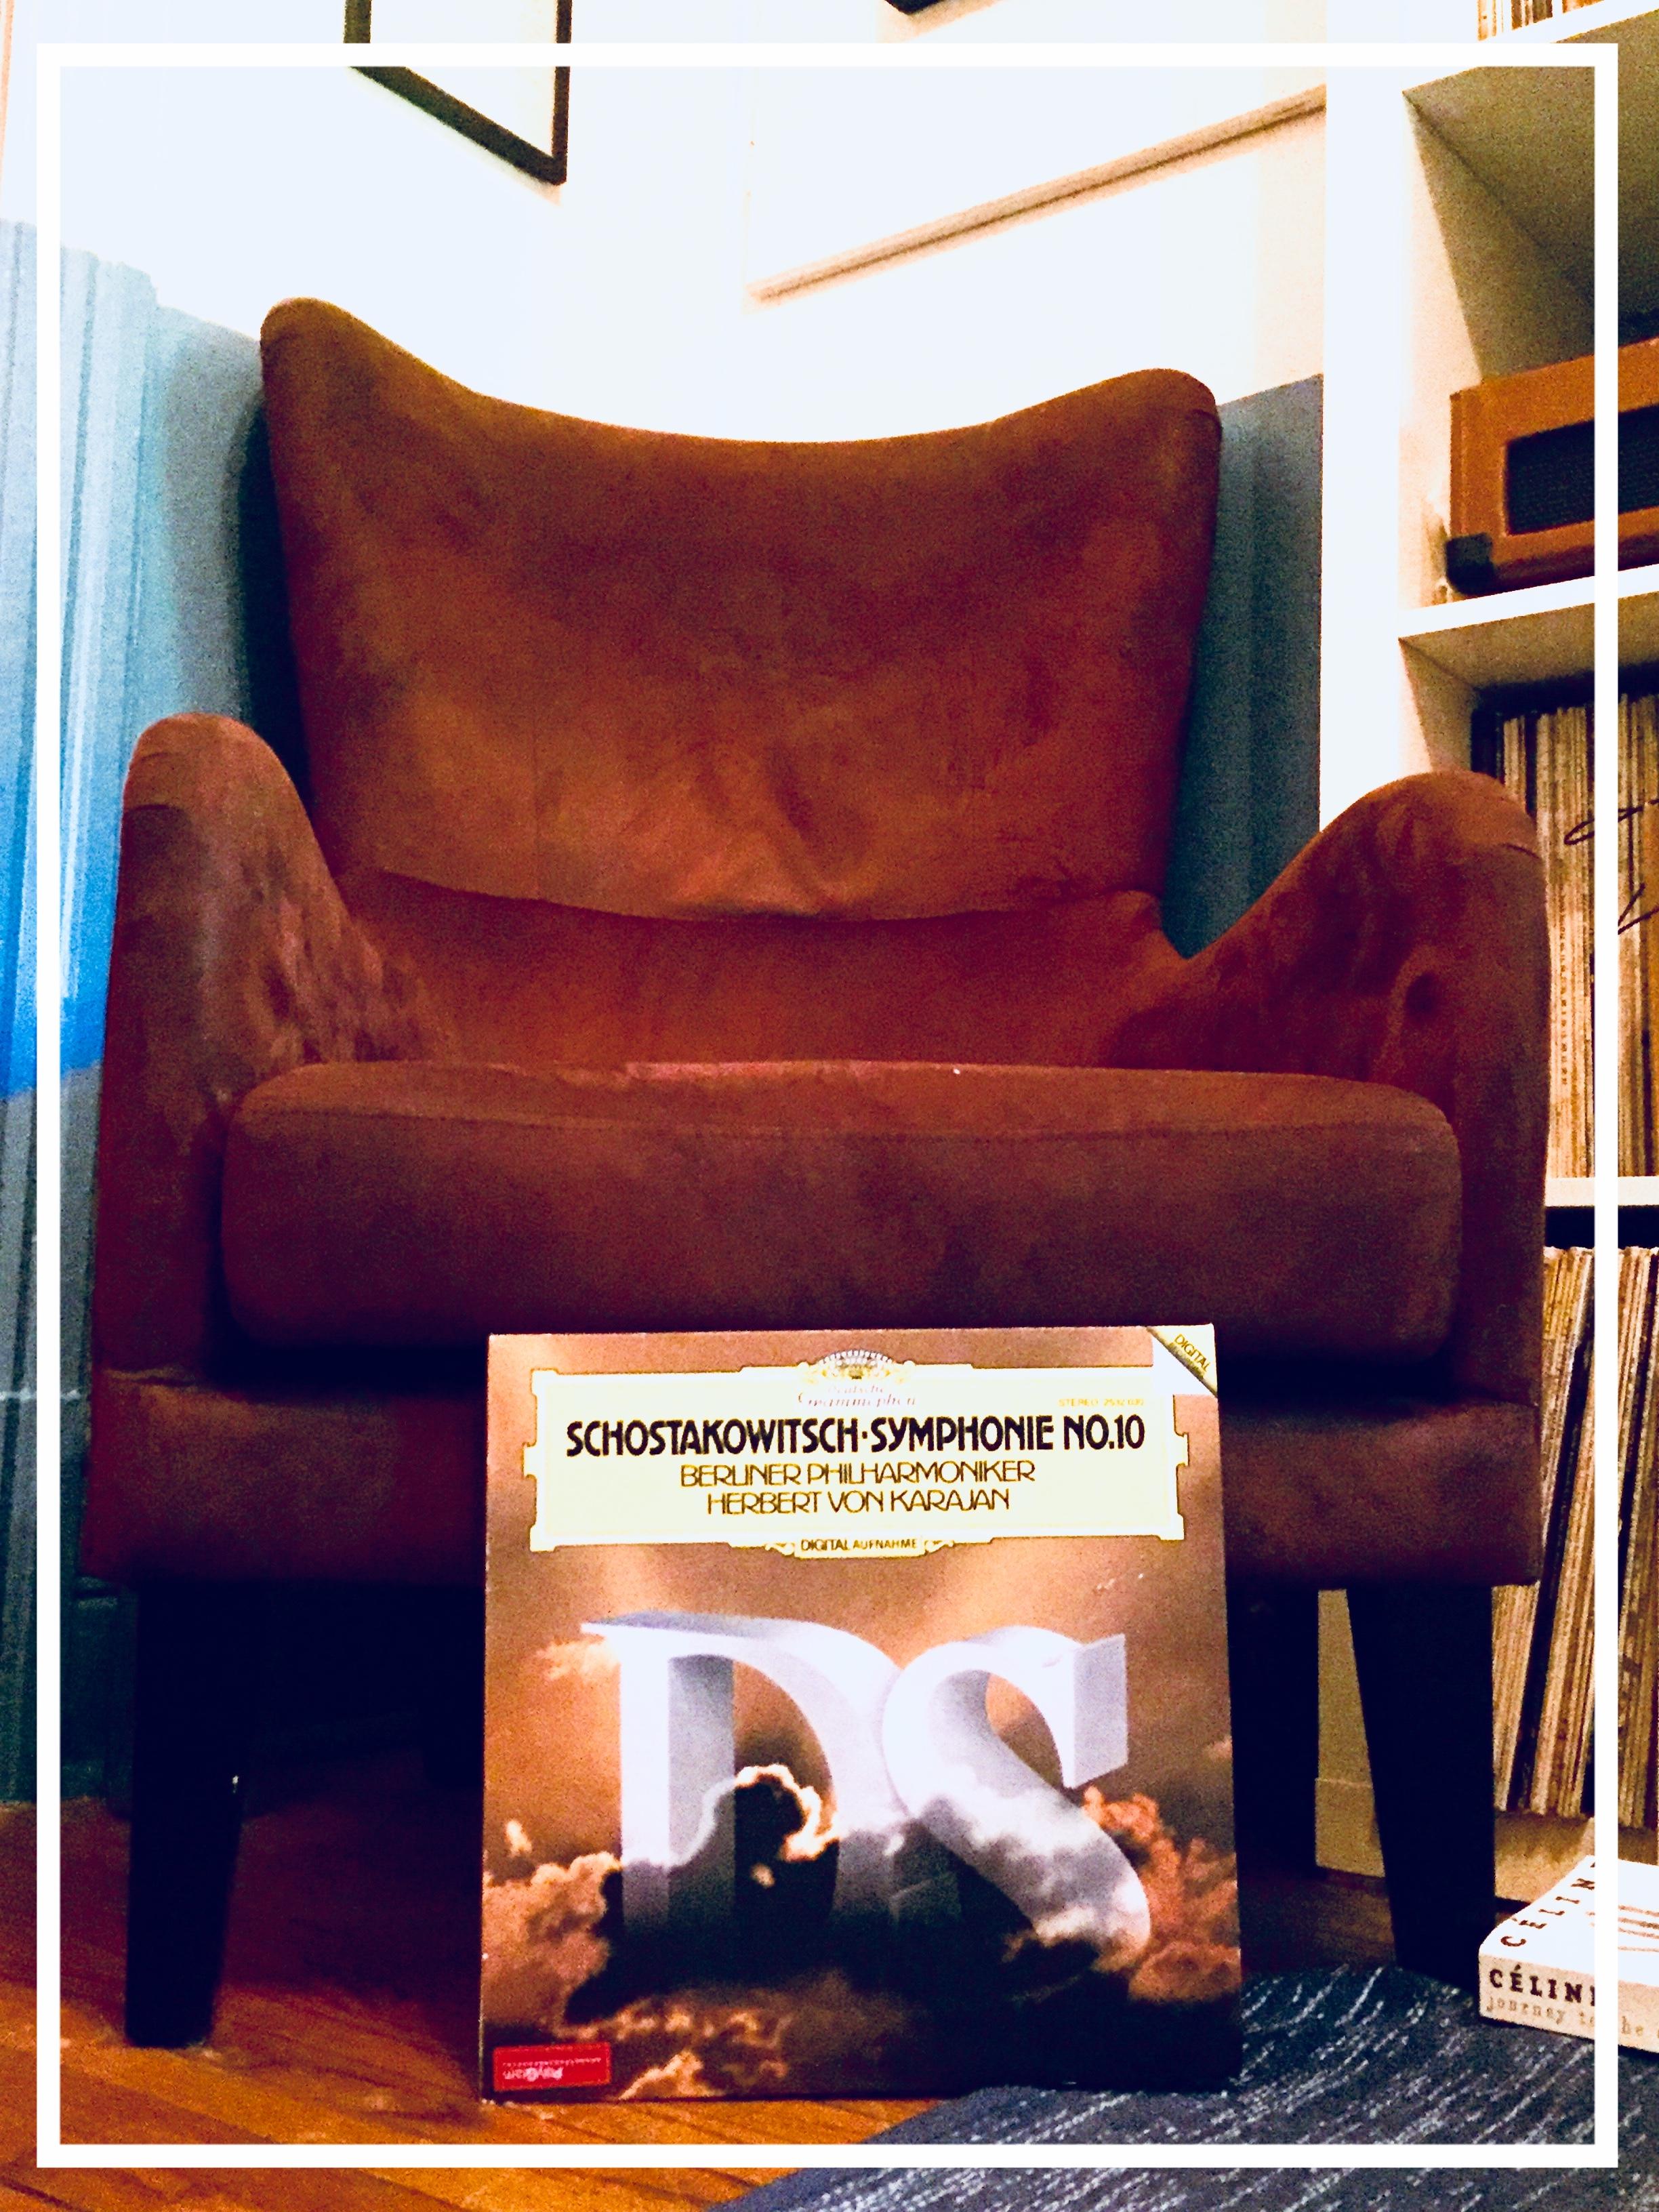 Shostakovitch Symphonie No. 10--Berlin Philharmonic--Conducted By Herbert Von Karajan